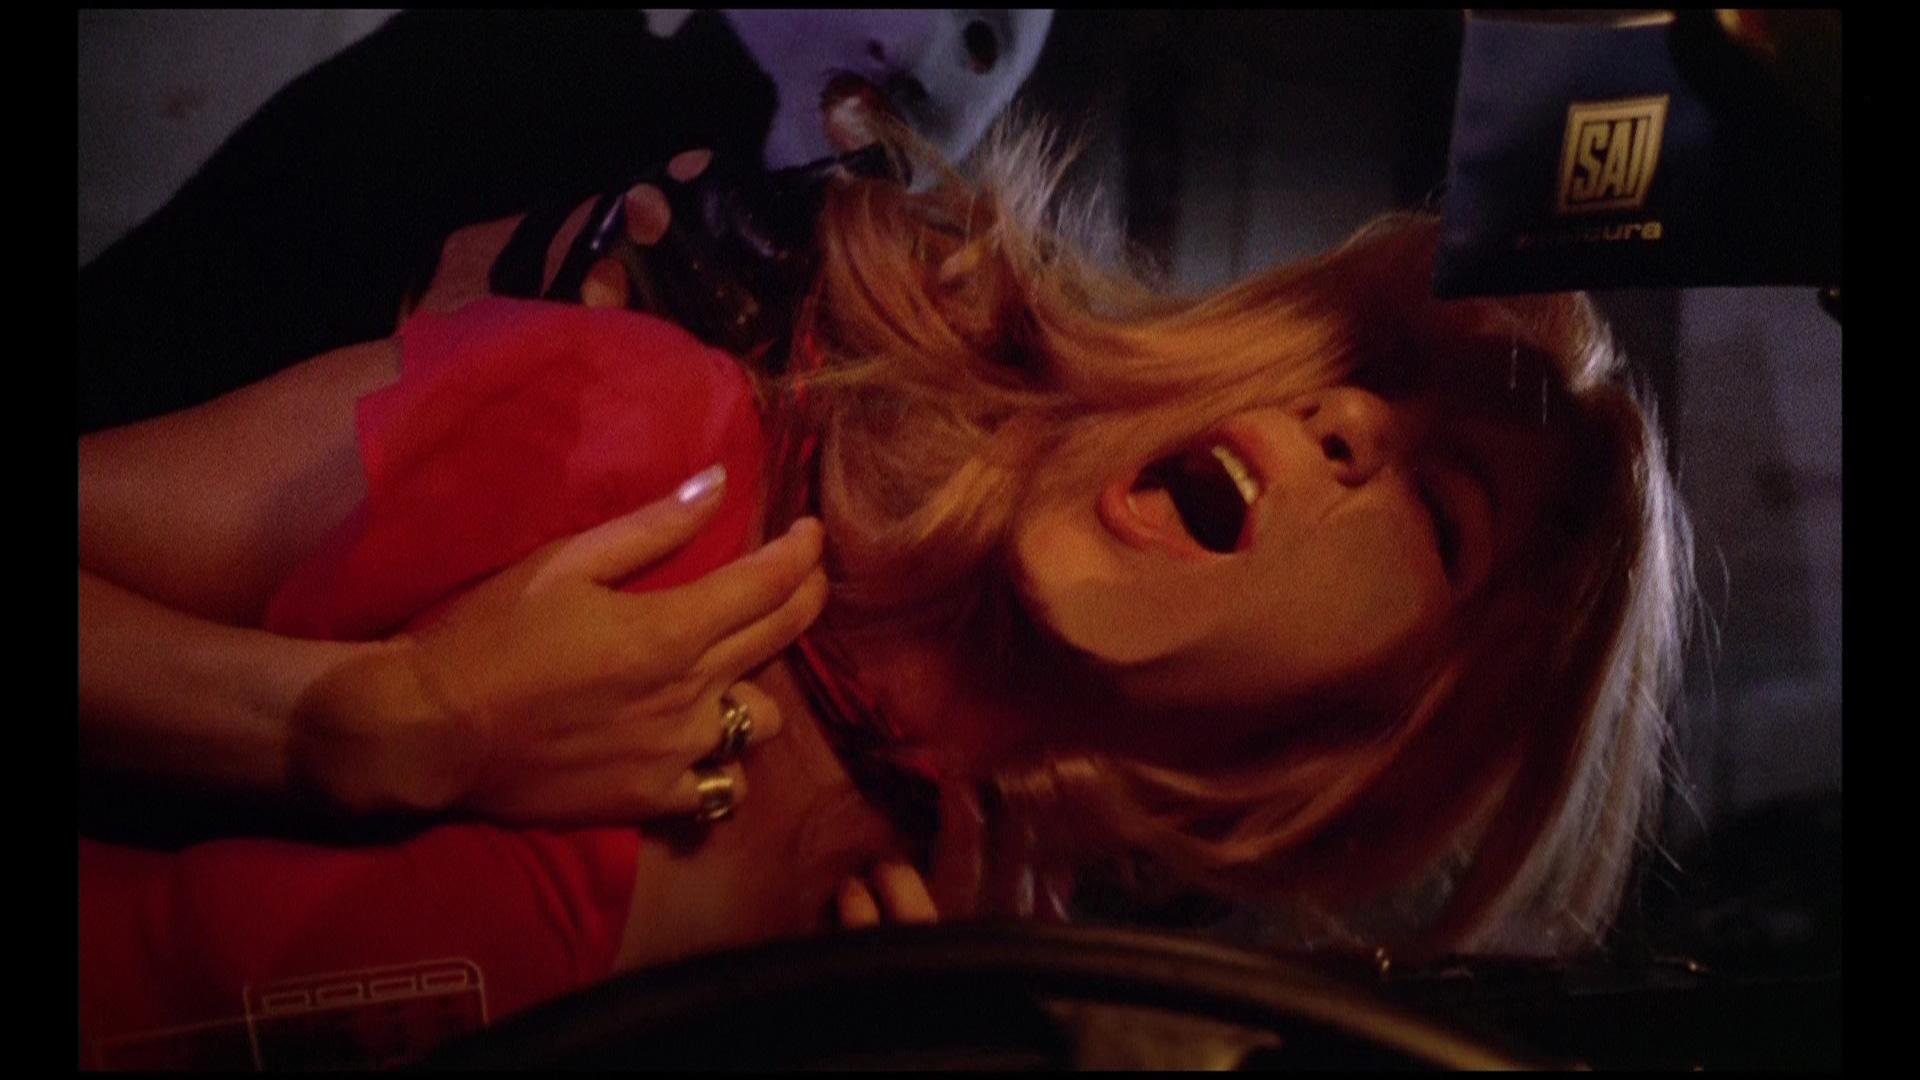 torso-bluray-the-ecstasy-of-film